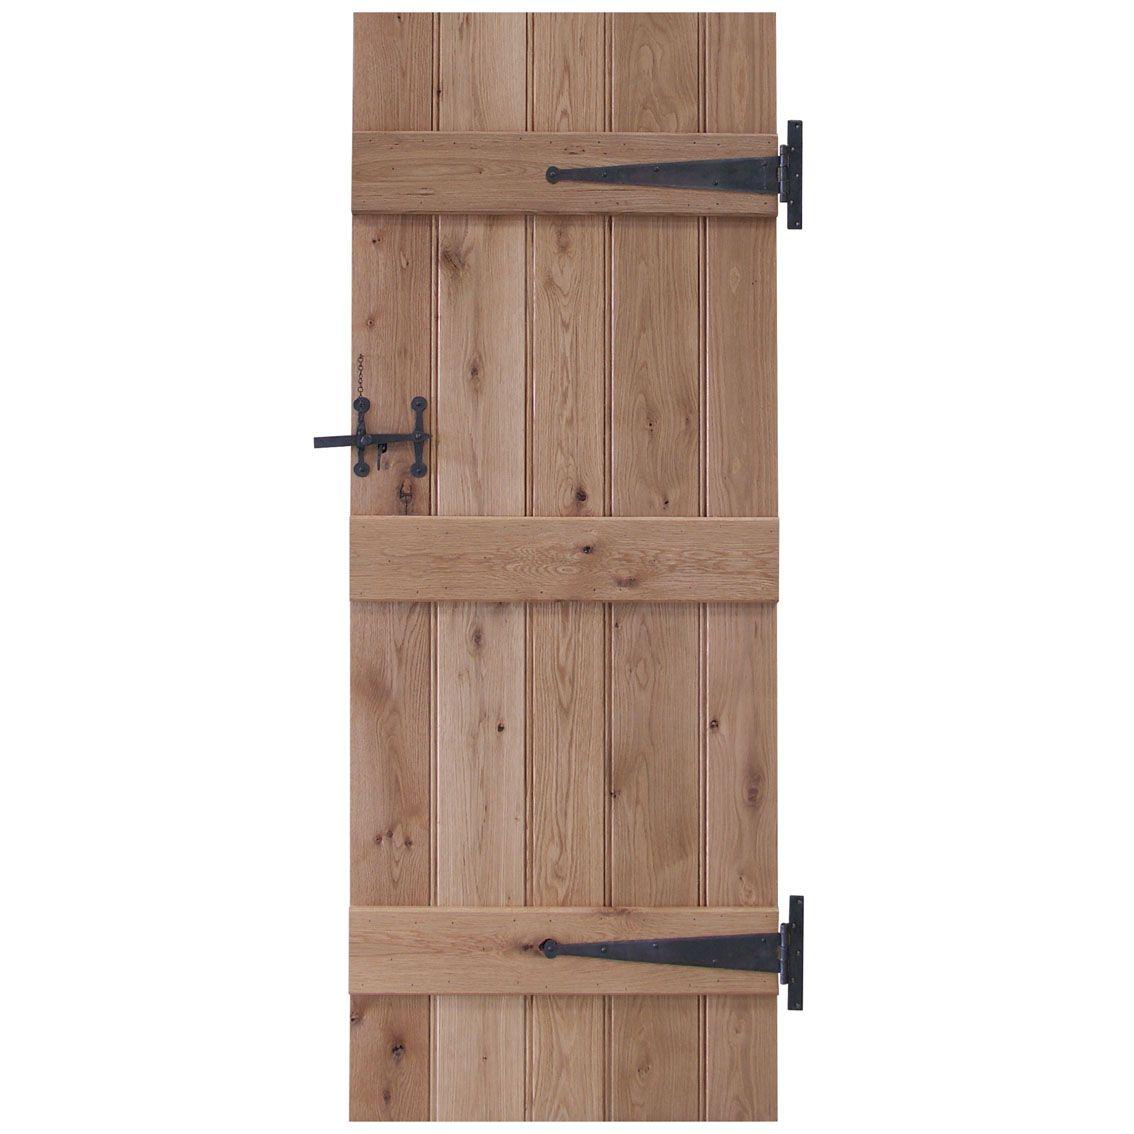 Mobile Home Cottage Door: £120.00 Solid Oak Cottage Internal Doors Manufactured By